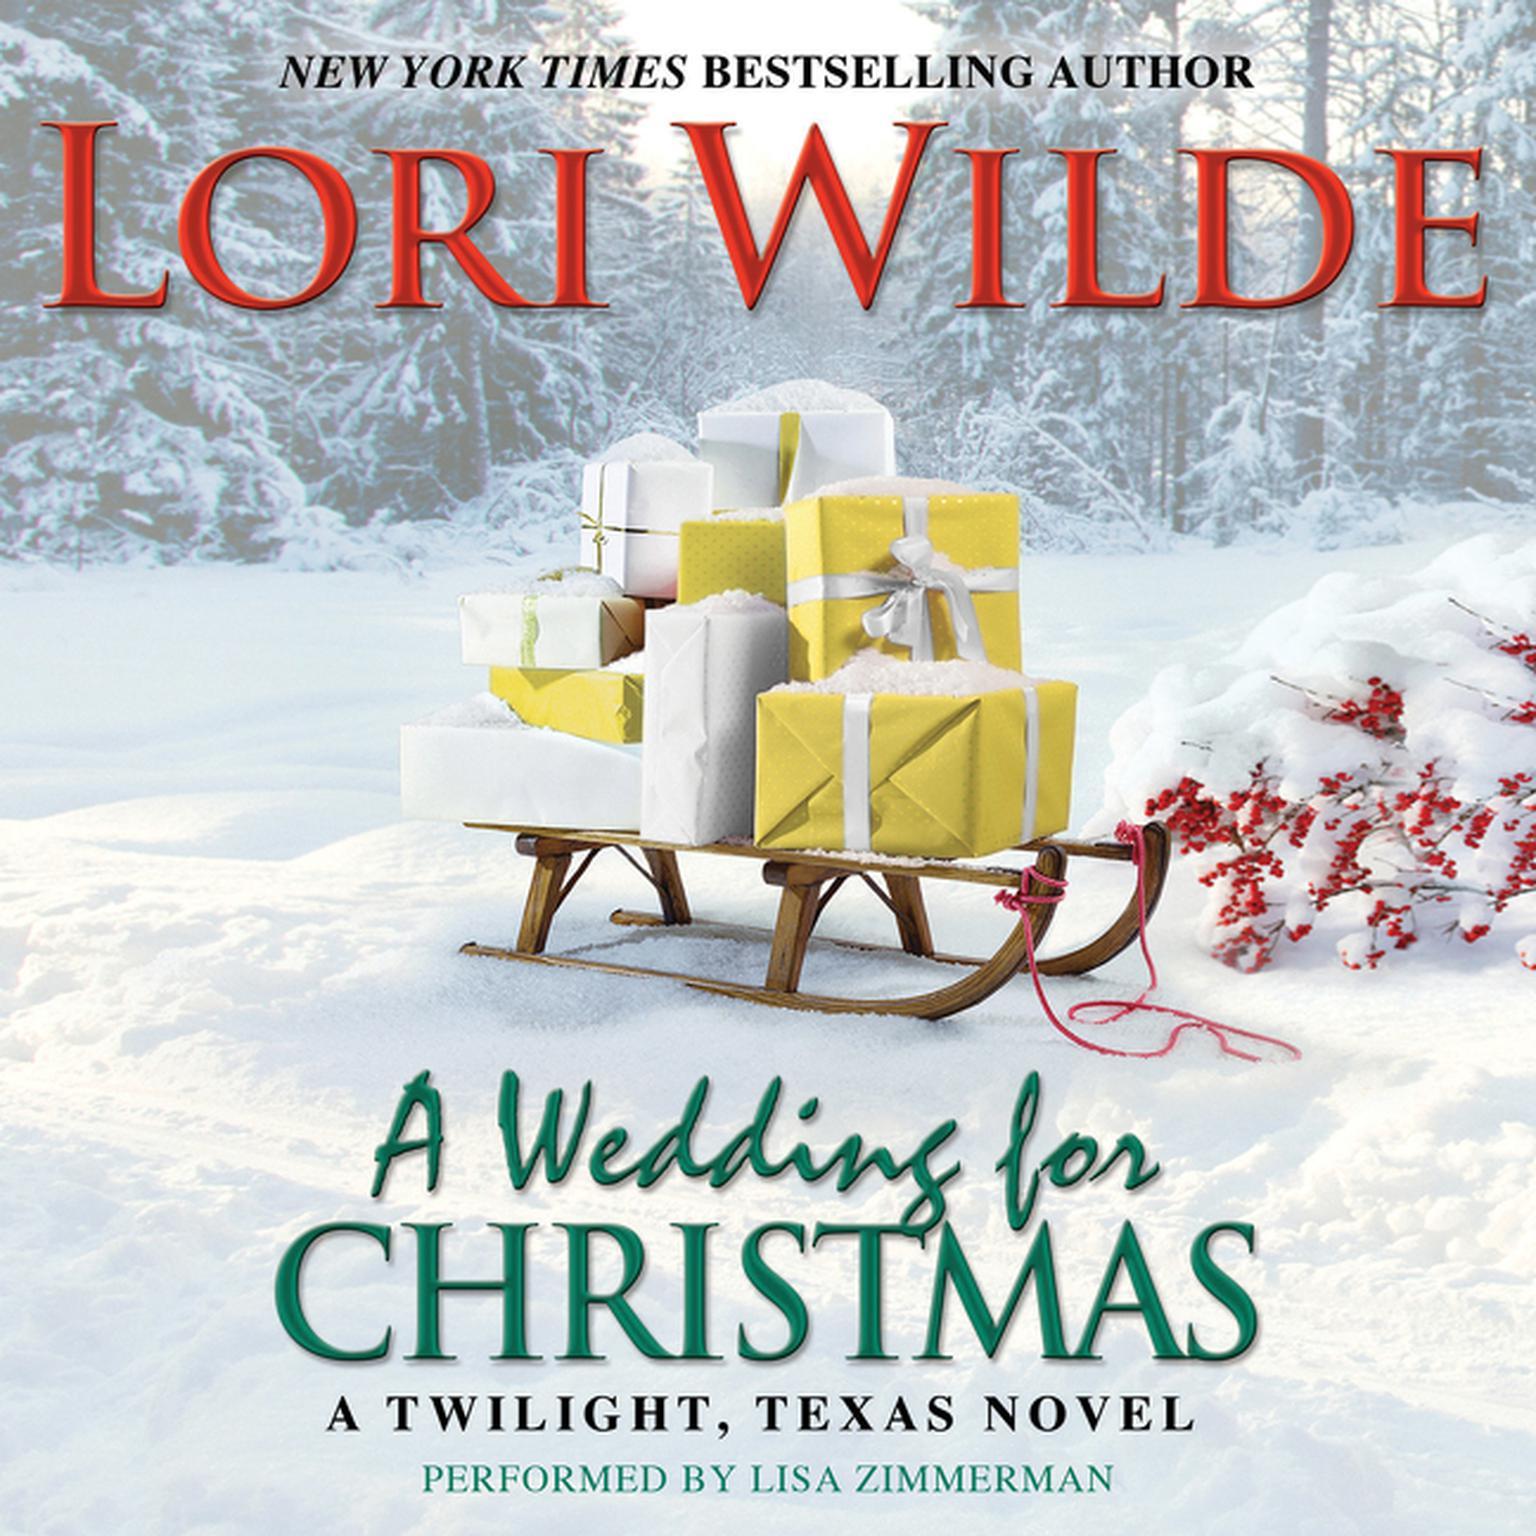 A Wedding for Christmas: A Twilight, Texas Novel Audiobook, by Lori Wilde